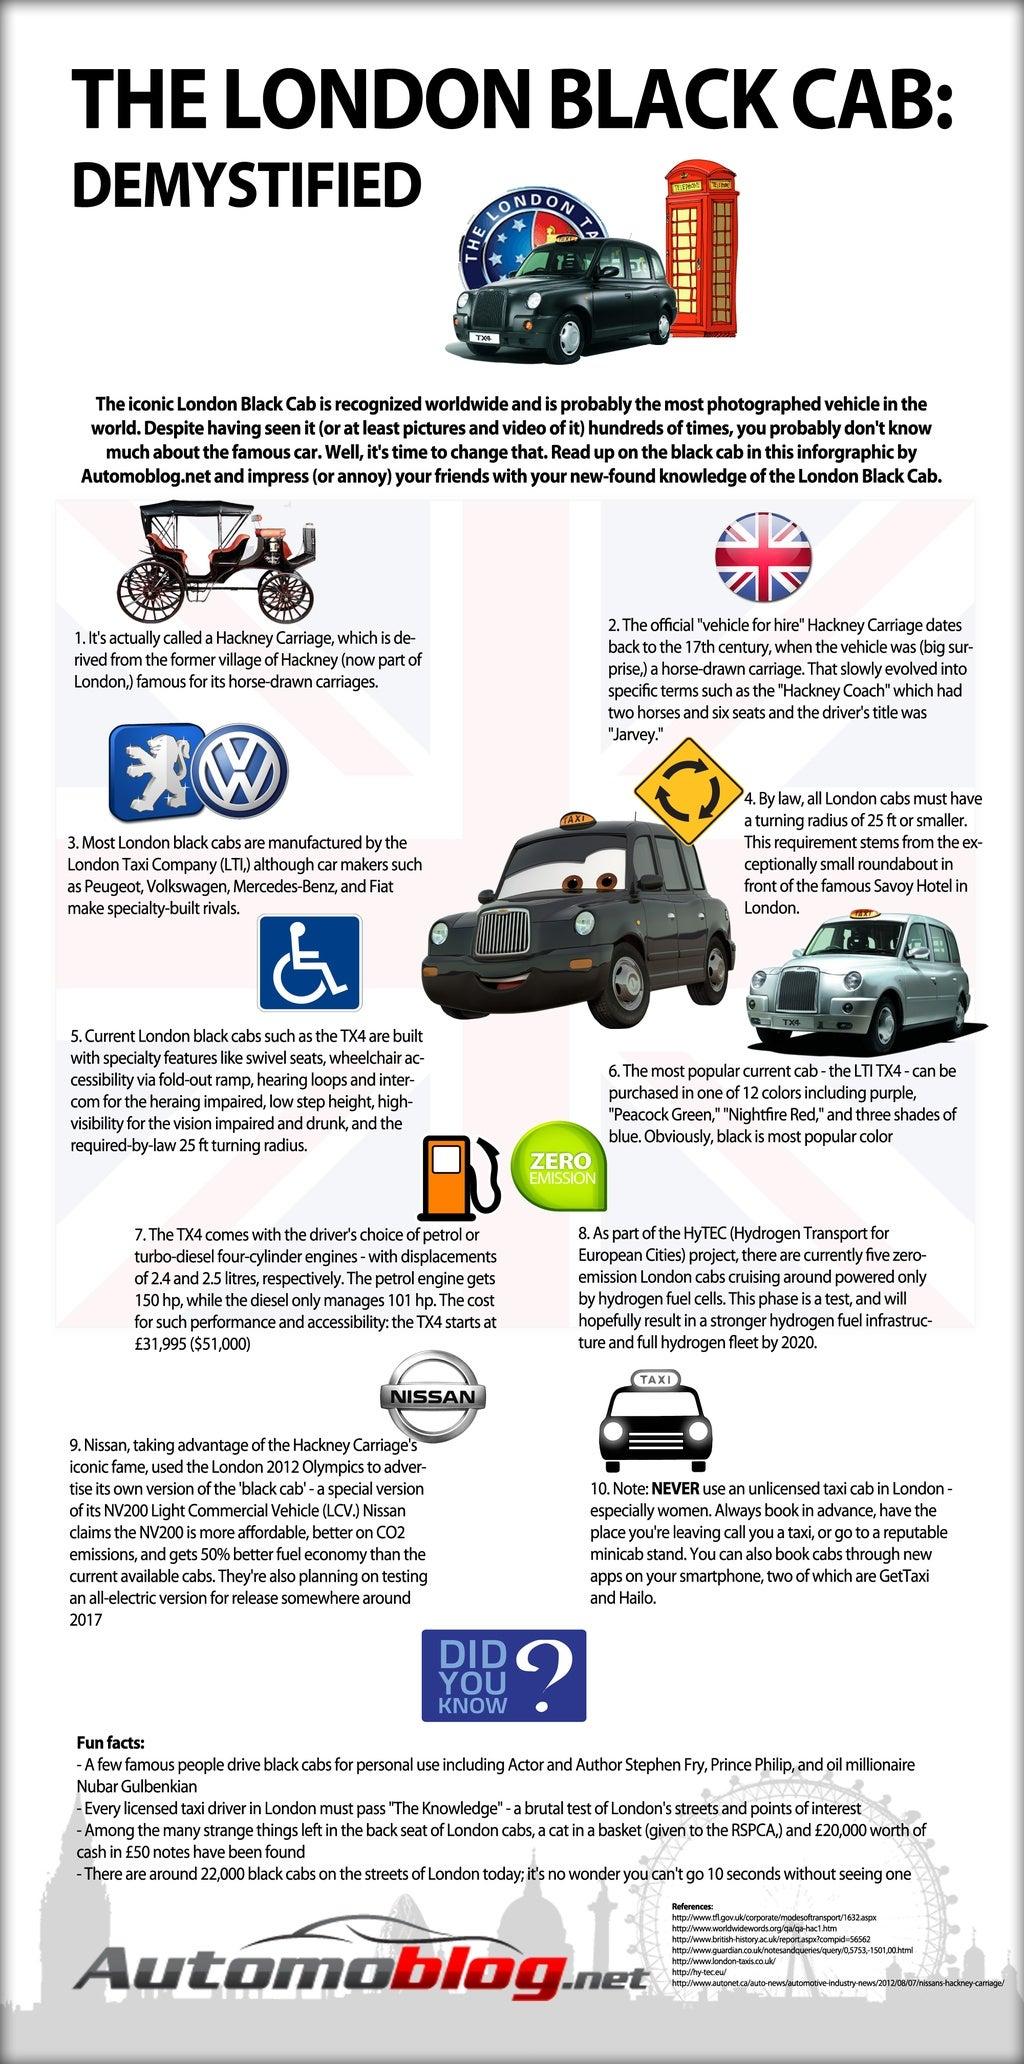 London Black Cab infographic